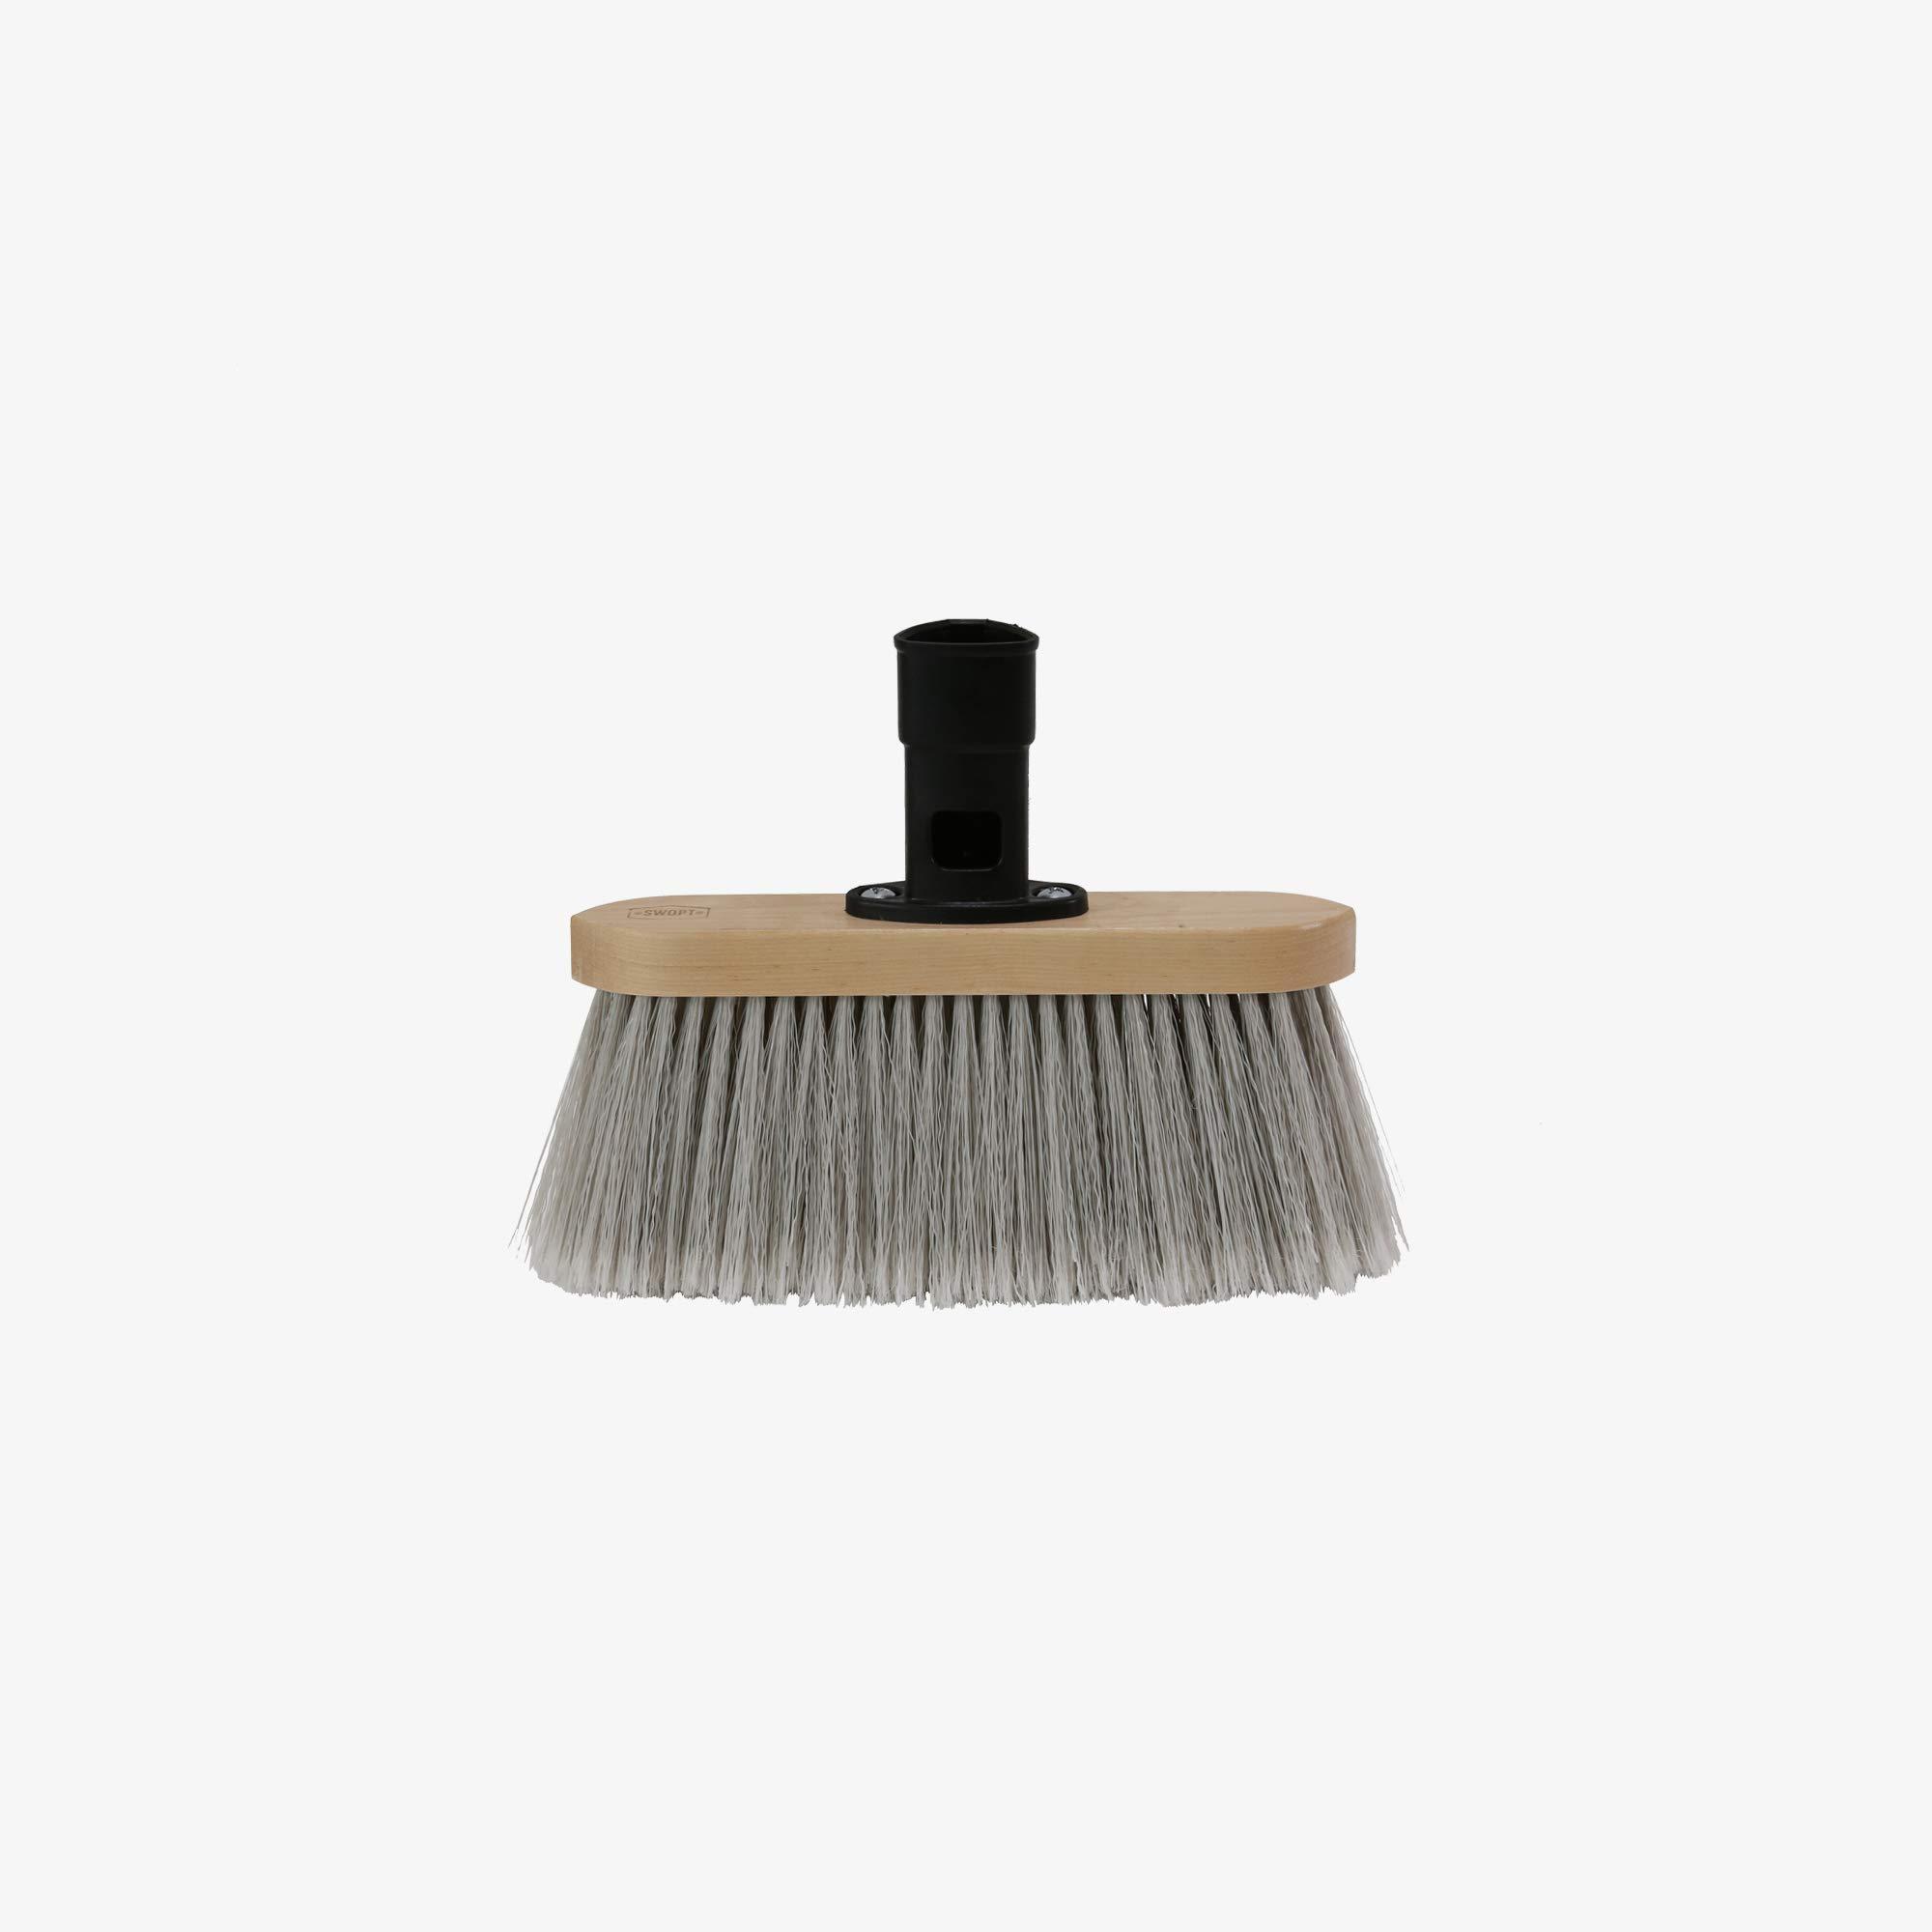 Swopt 5120C6 Premium Smooth Surface Straight Broom Head